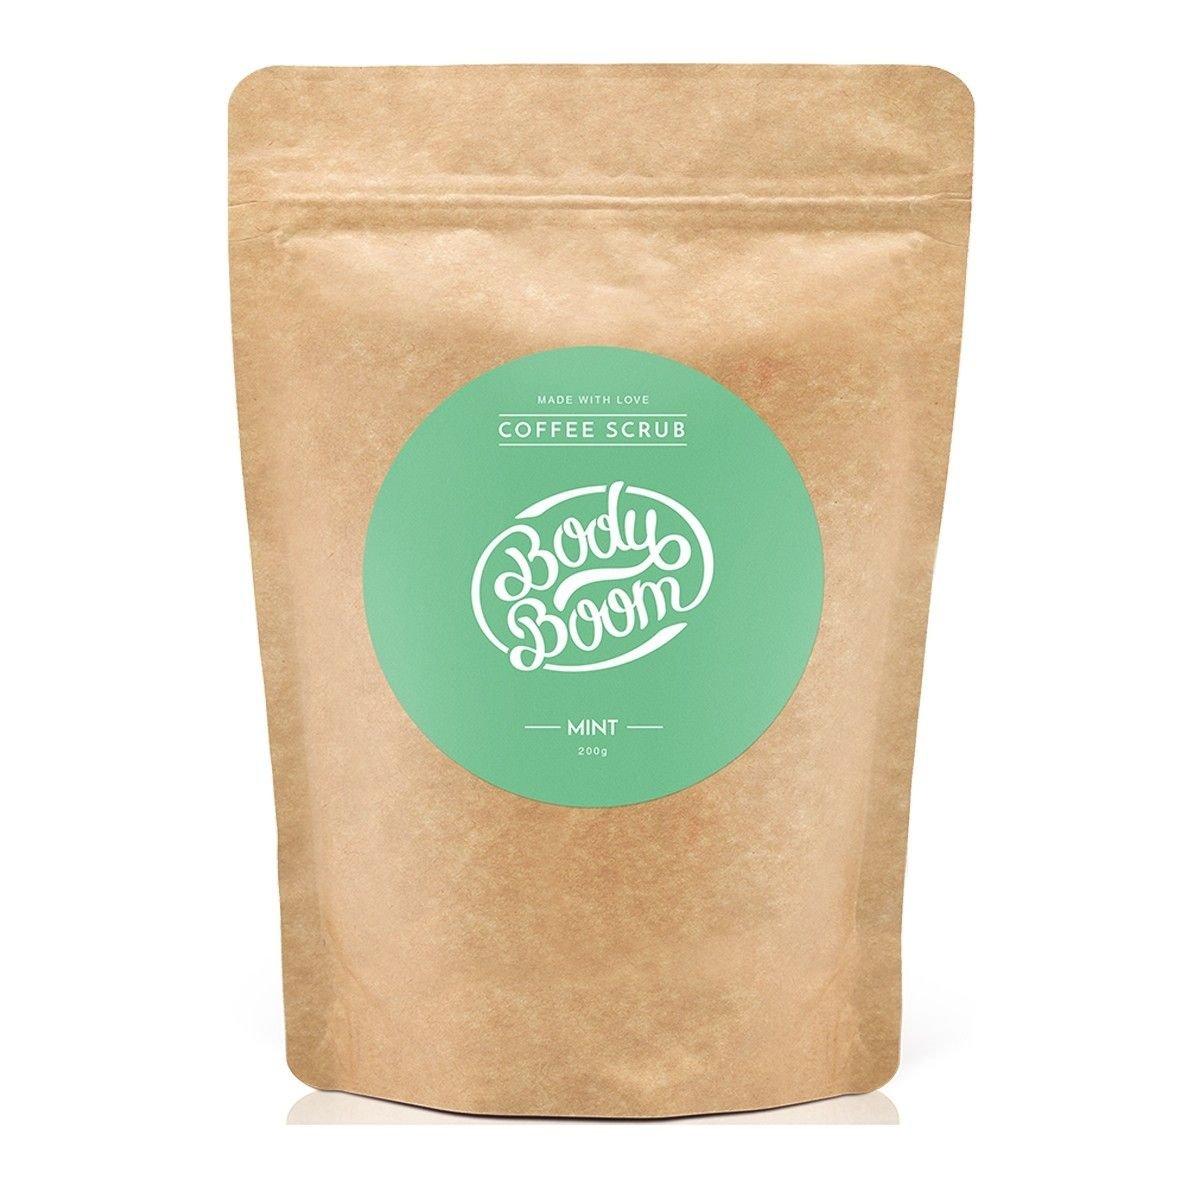 Afbeelding van Bodyboom Coffee Scrub Mint Bodyscrub Beauty